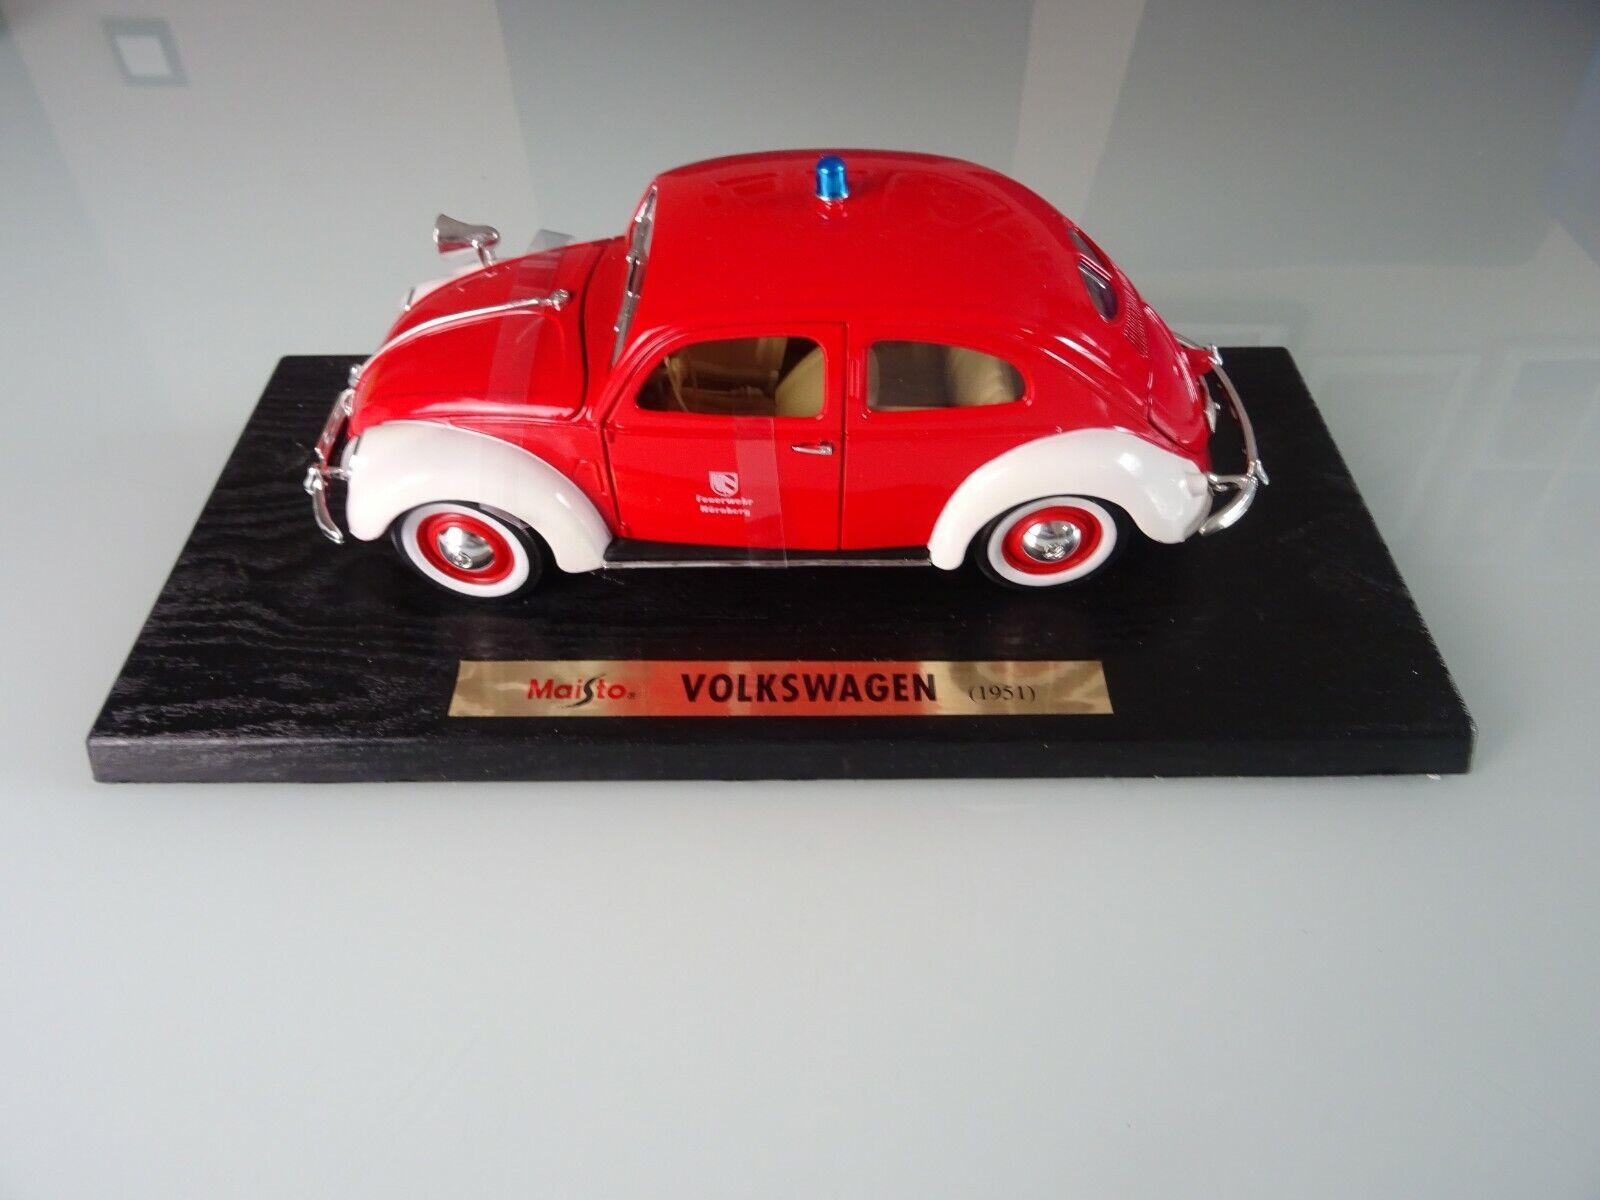 MAISTO 1 18 VW Volkswagen 1951 COCCINELLE POMPIERS Nuremberg neuf dans sa boîte box Nº 56005